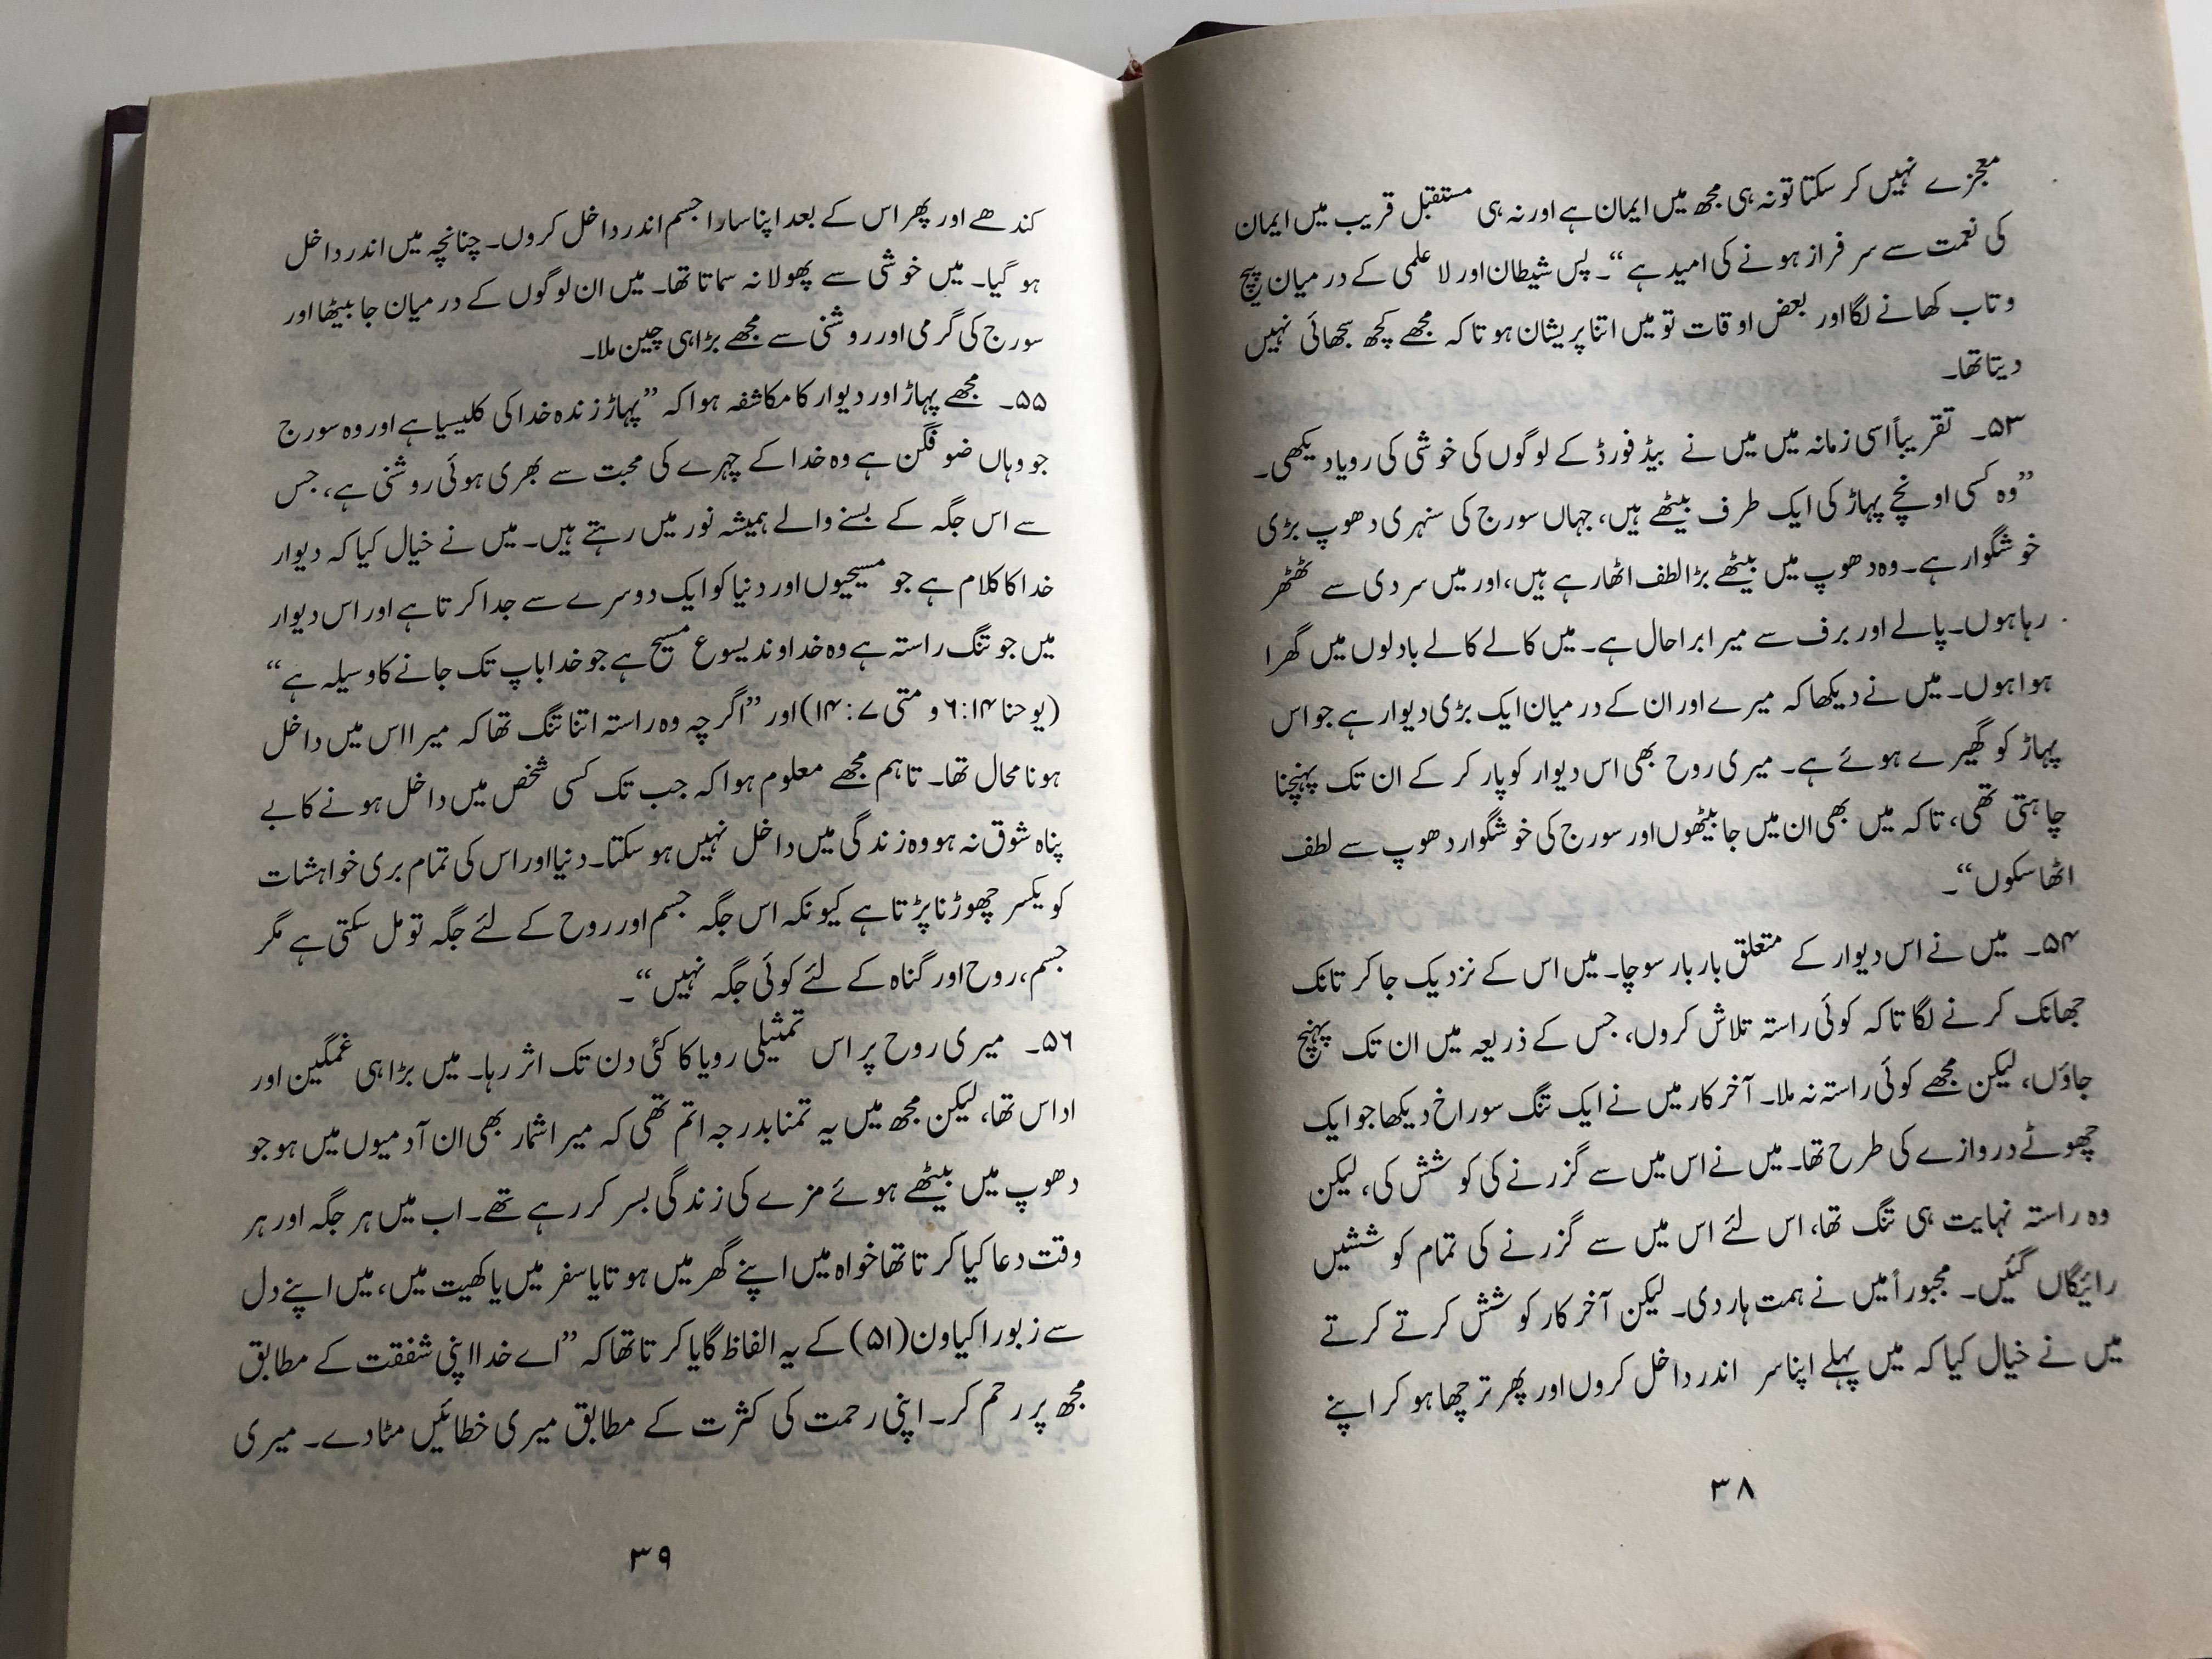 grace-abounding-by-john-bunyan-in-urdu-language-hardcover-grace-abounding-to-the-chief-of-sinners-spiritual-autobiography-of-bunyan-7-.jpg